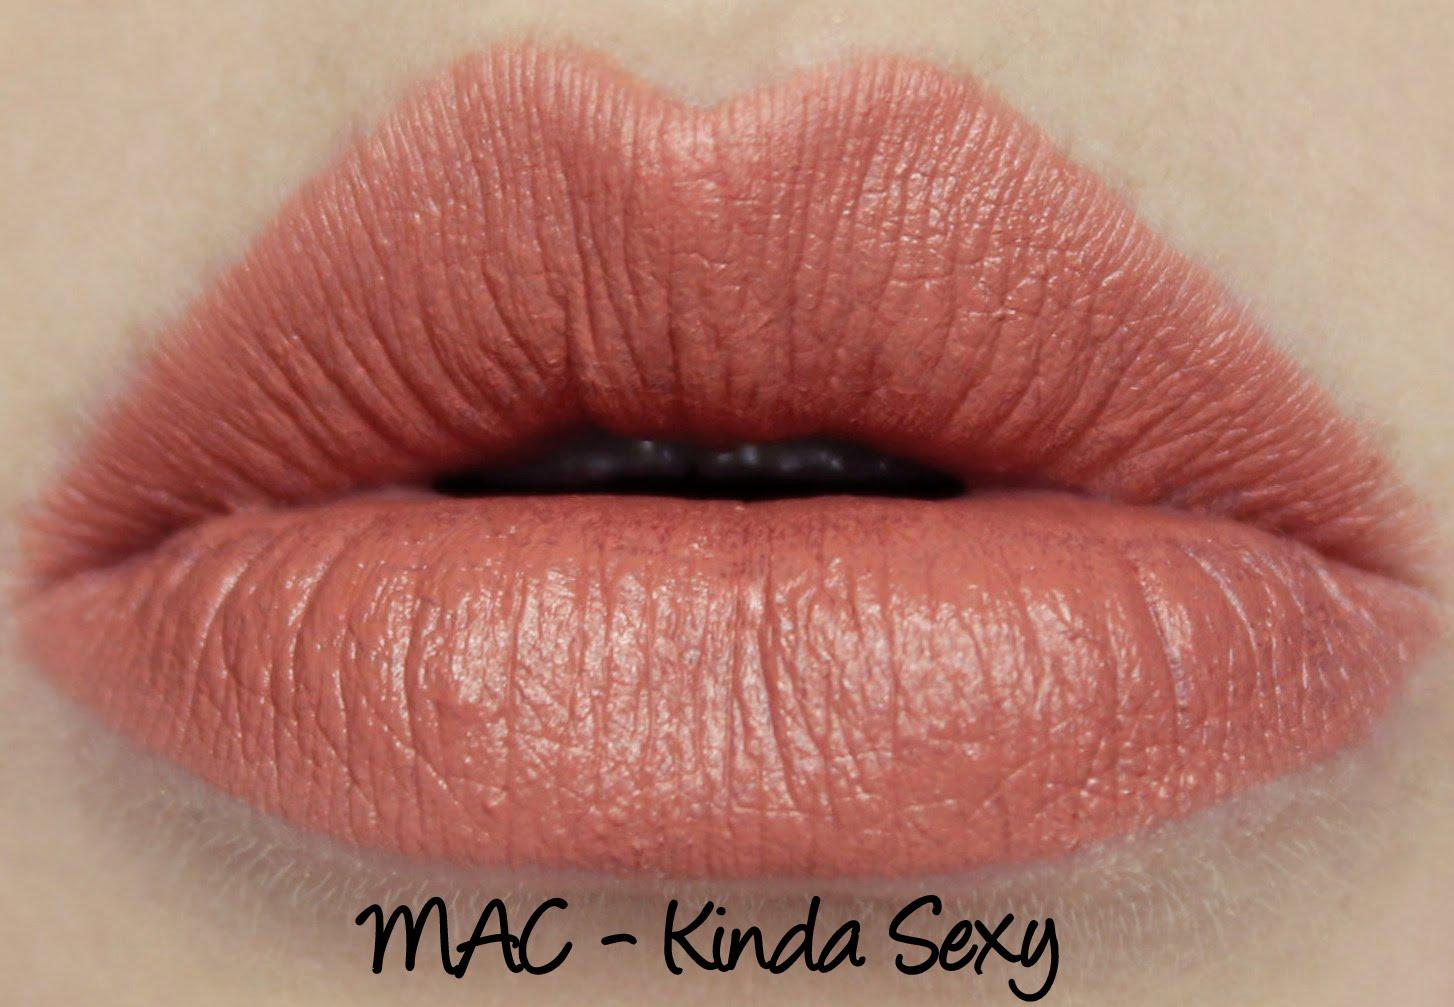 MAC Kinda Sexy lipstick swatch